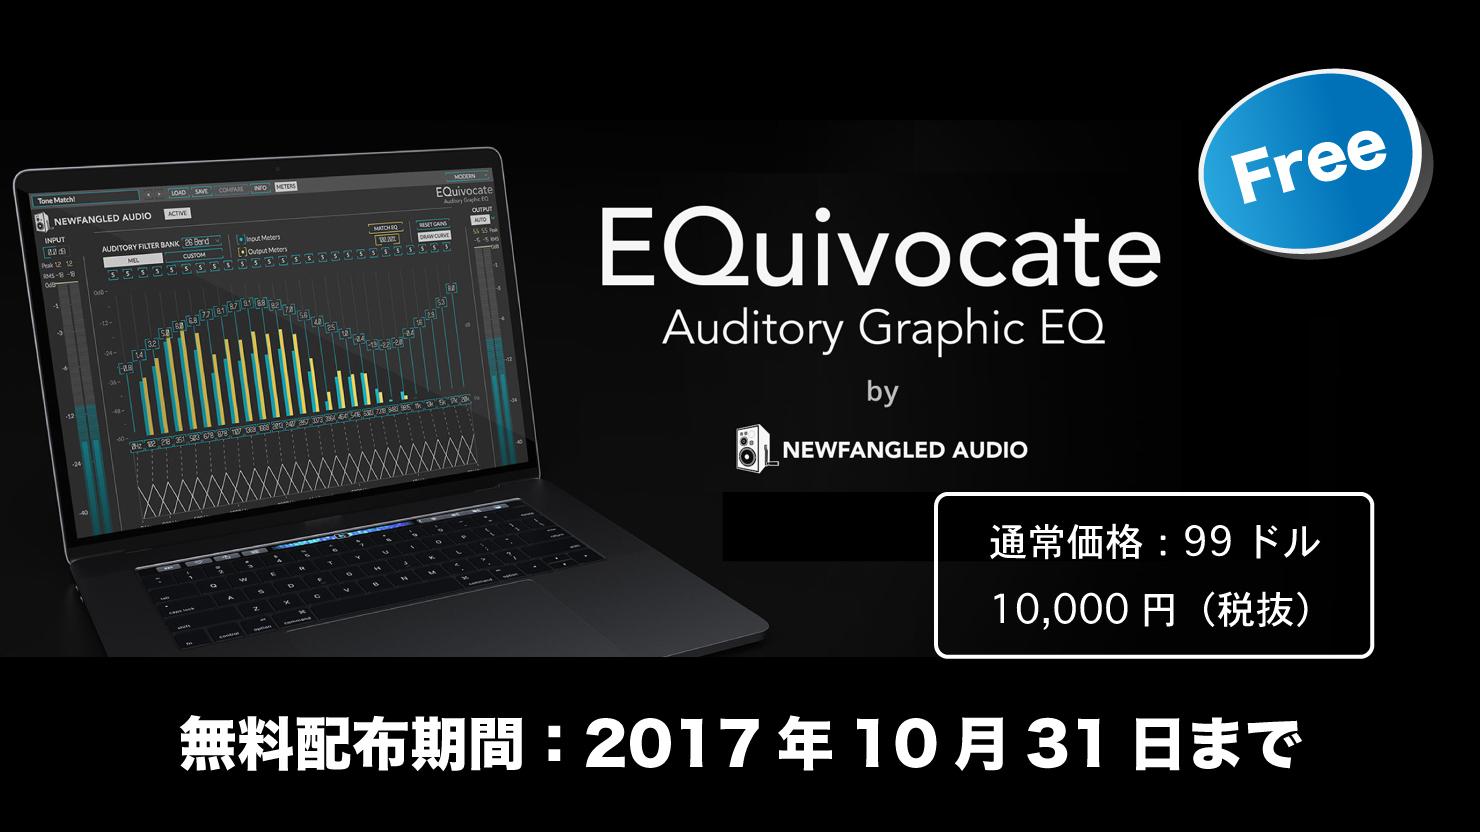 equivocate-free